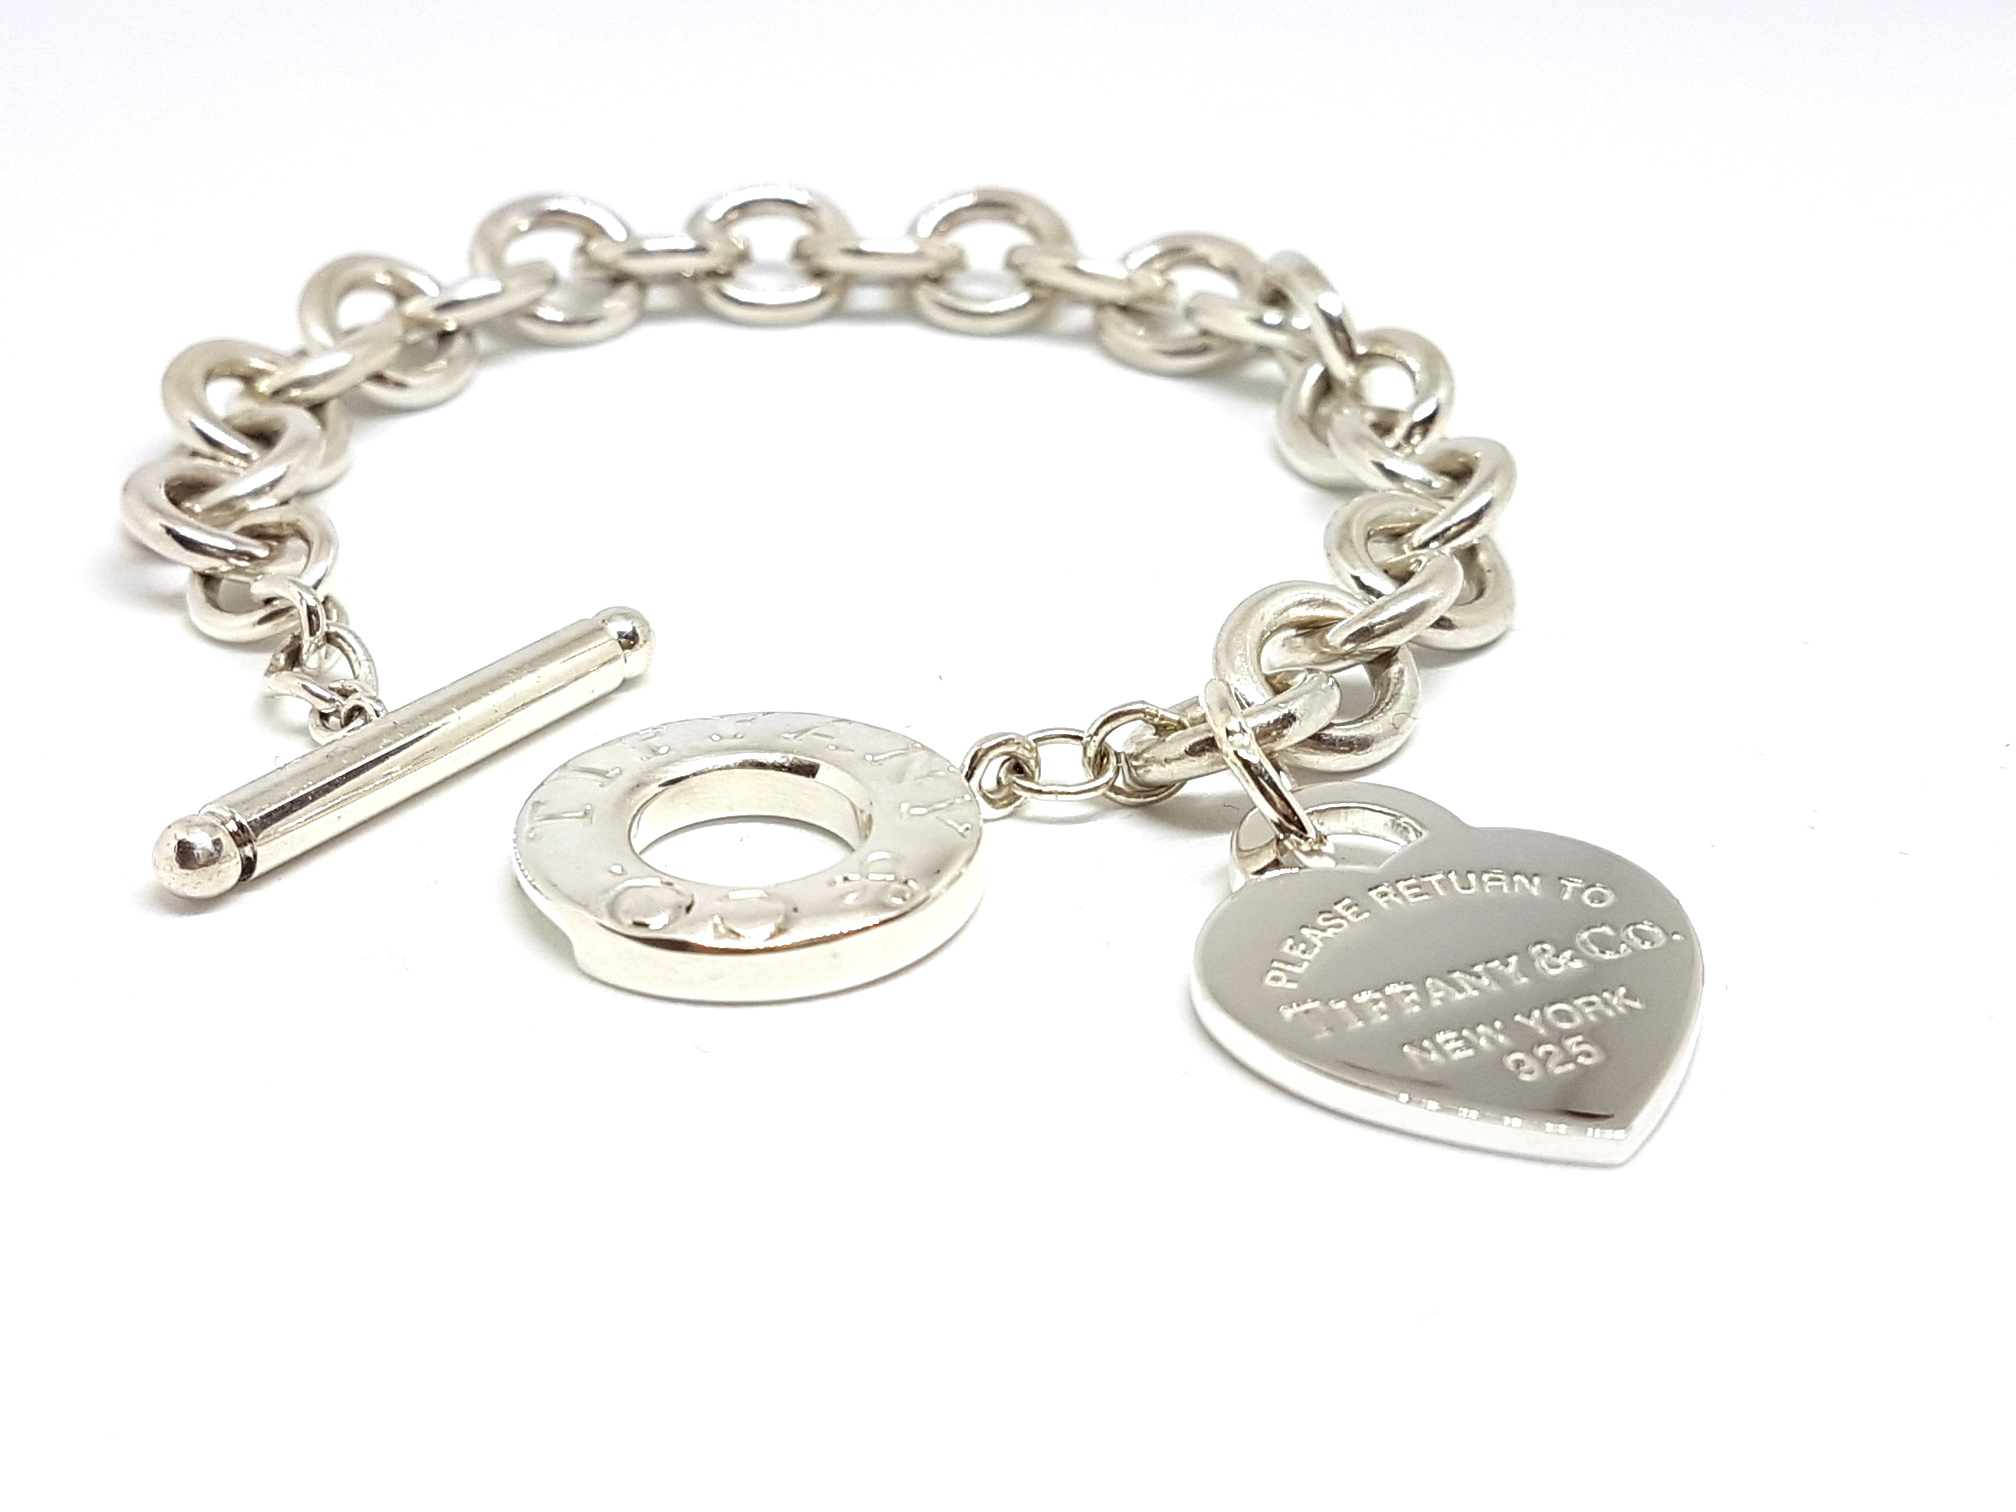 09c13324b3ce2 Tiffany & Co. Return To Tiffany 925 Sterling Silver Heart Tag Toggle  Bracelet